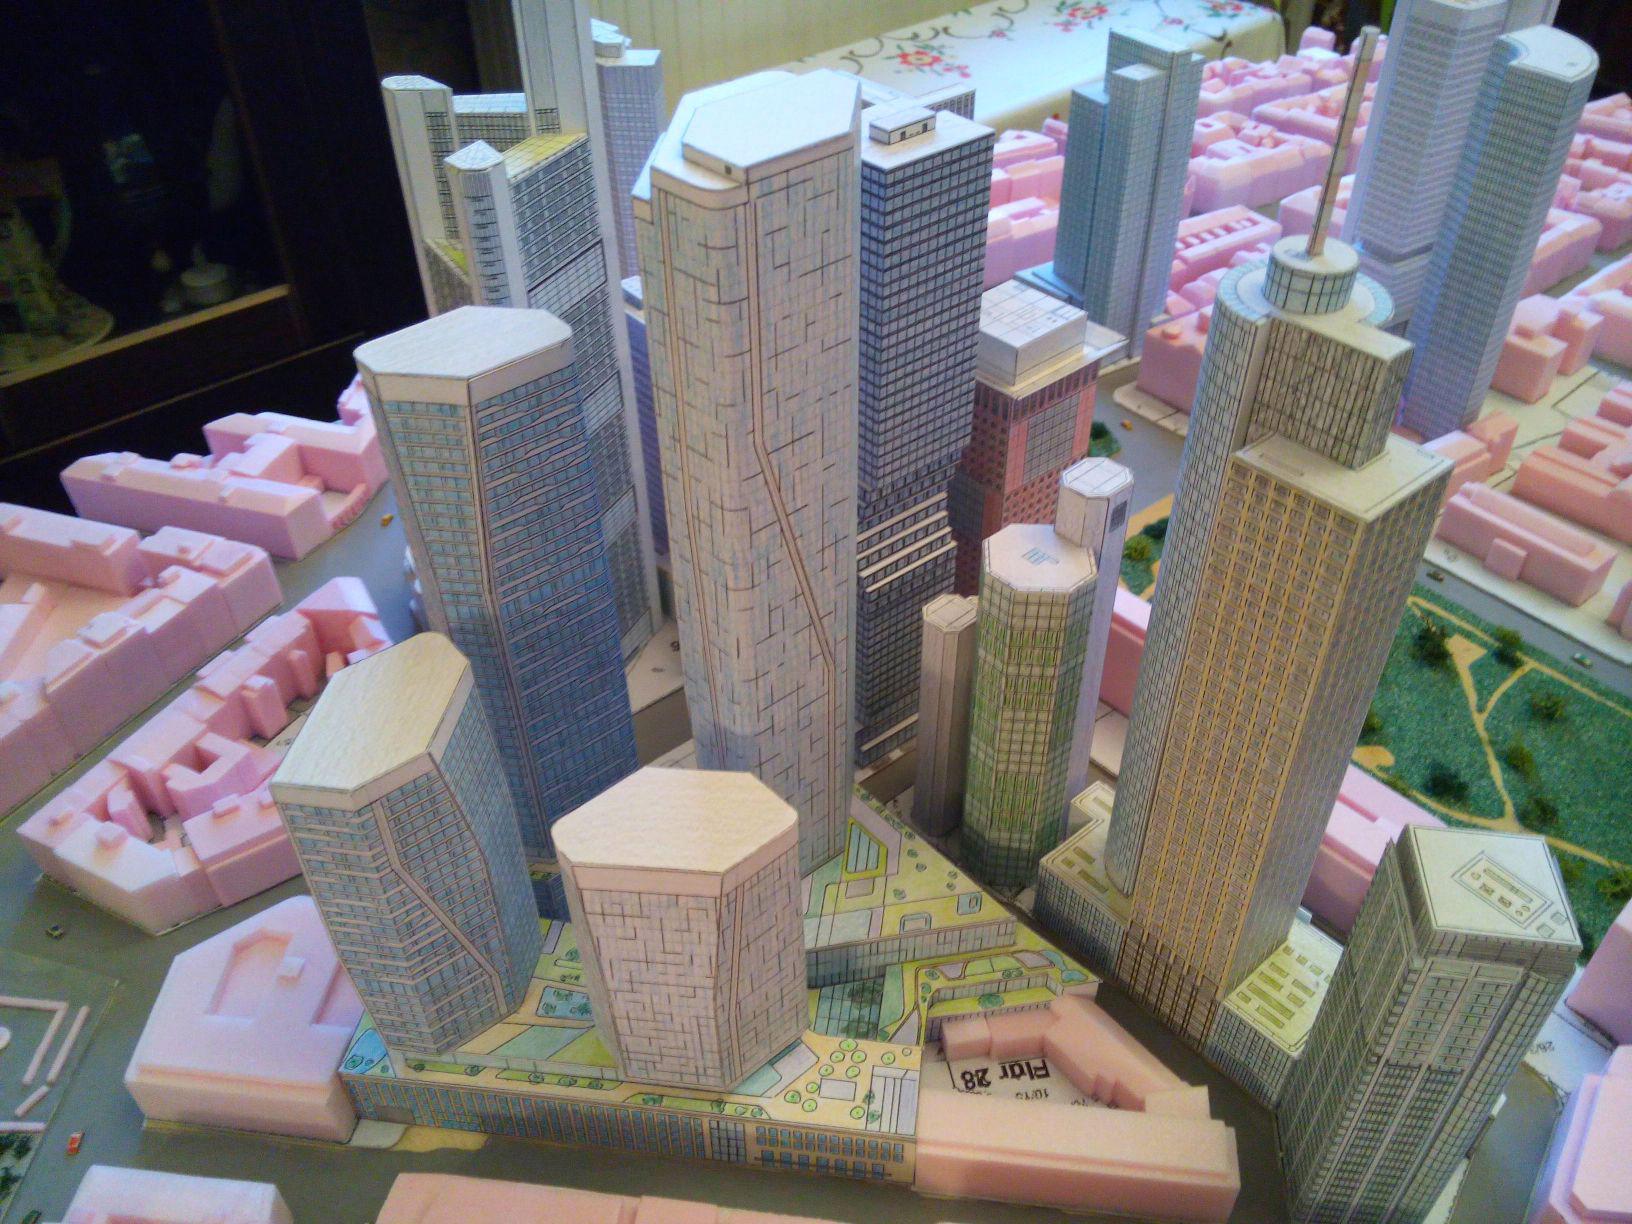 Bankenviertel Modell - Stadtmodell Frankfurt - Hochhausmodell von Frank Reuter - mit FOUR Frankfurt